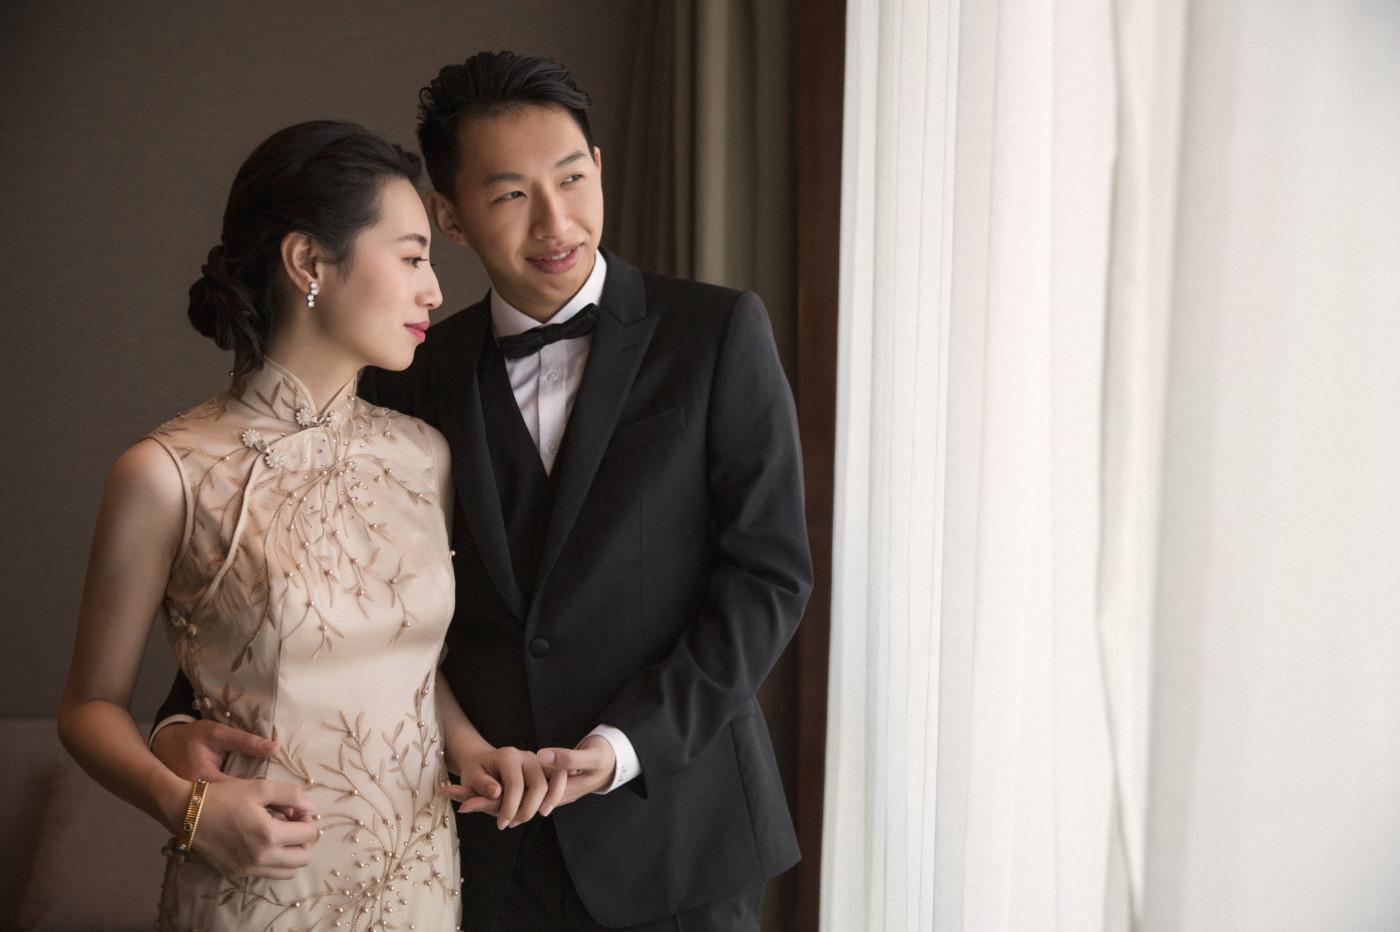 【KAI 婚礼纪实】Z&Y 常州婚礼14